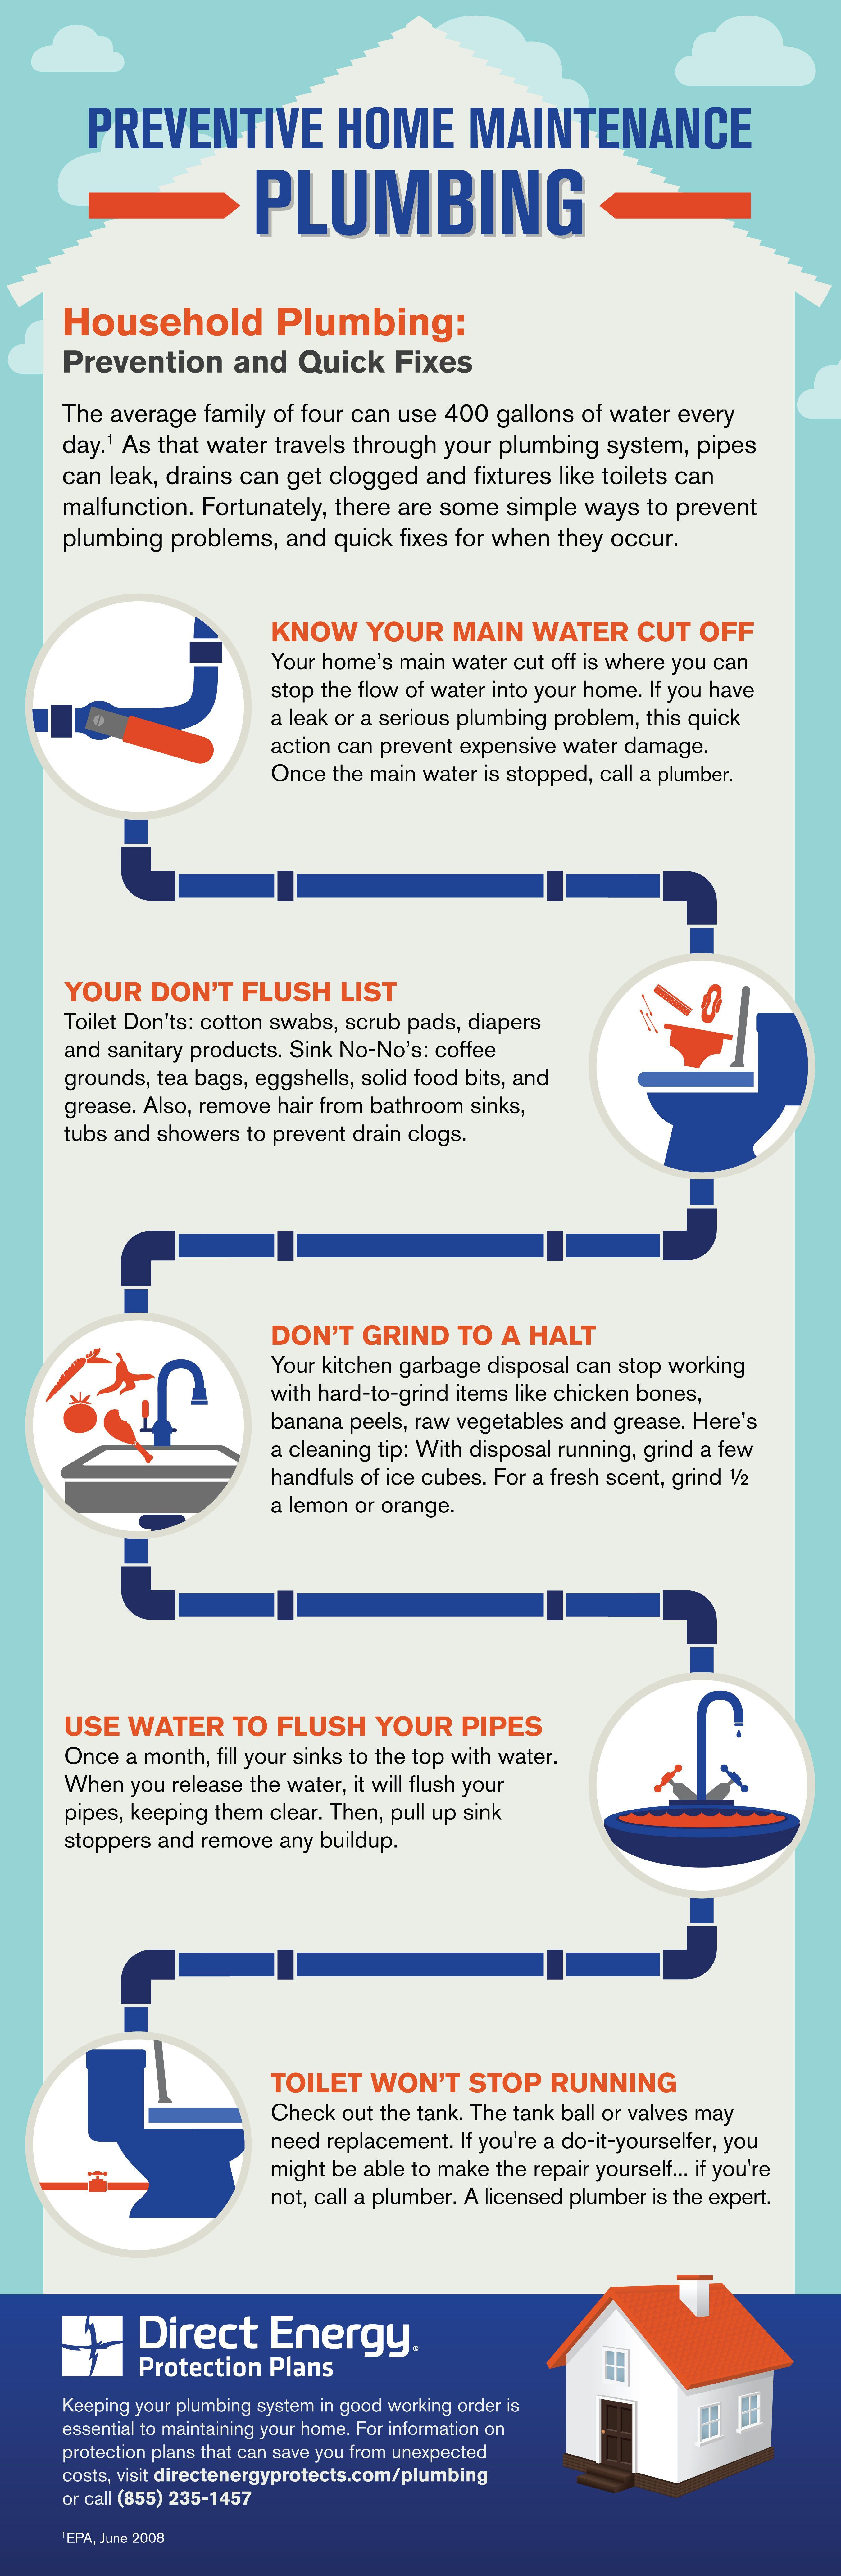 Ontario California Plumbing Heating And Air Conditioning Plumbing Problems Home Maintenance Plumbing Emergency